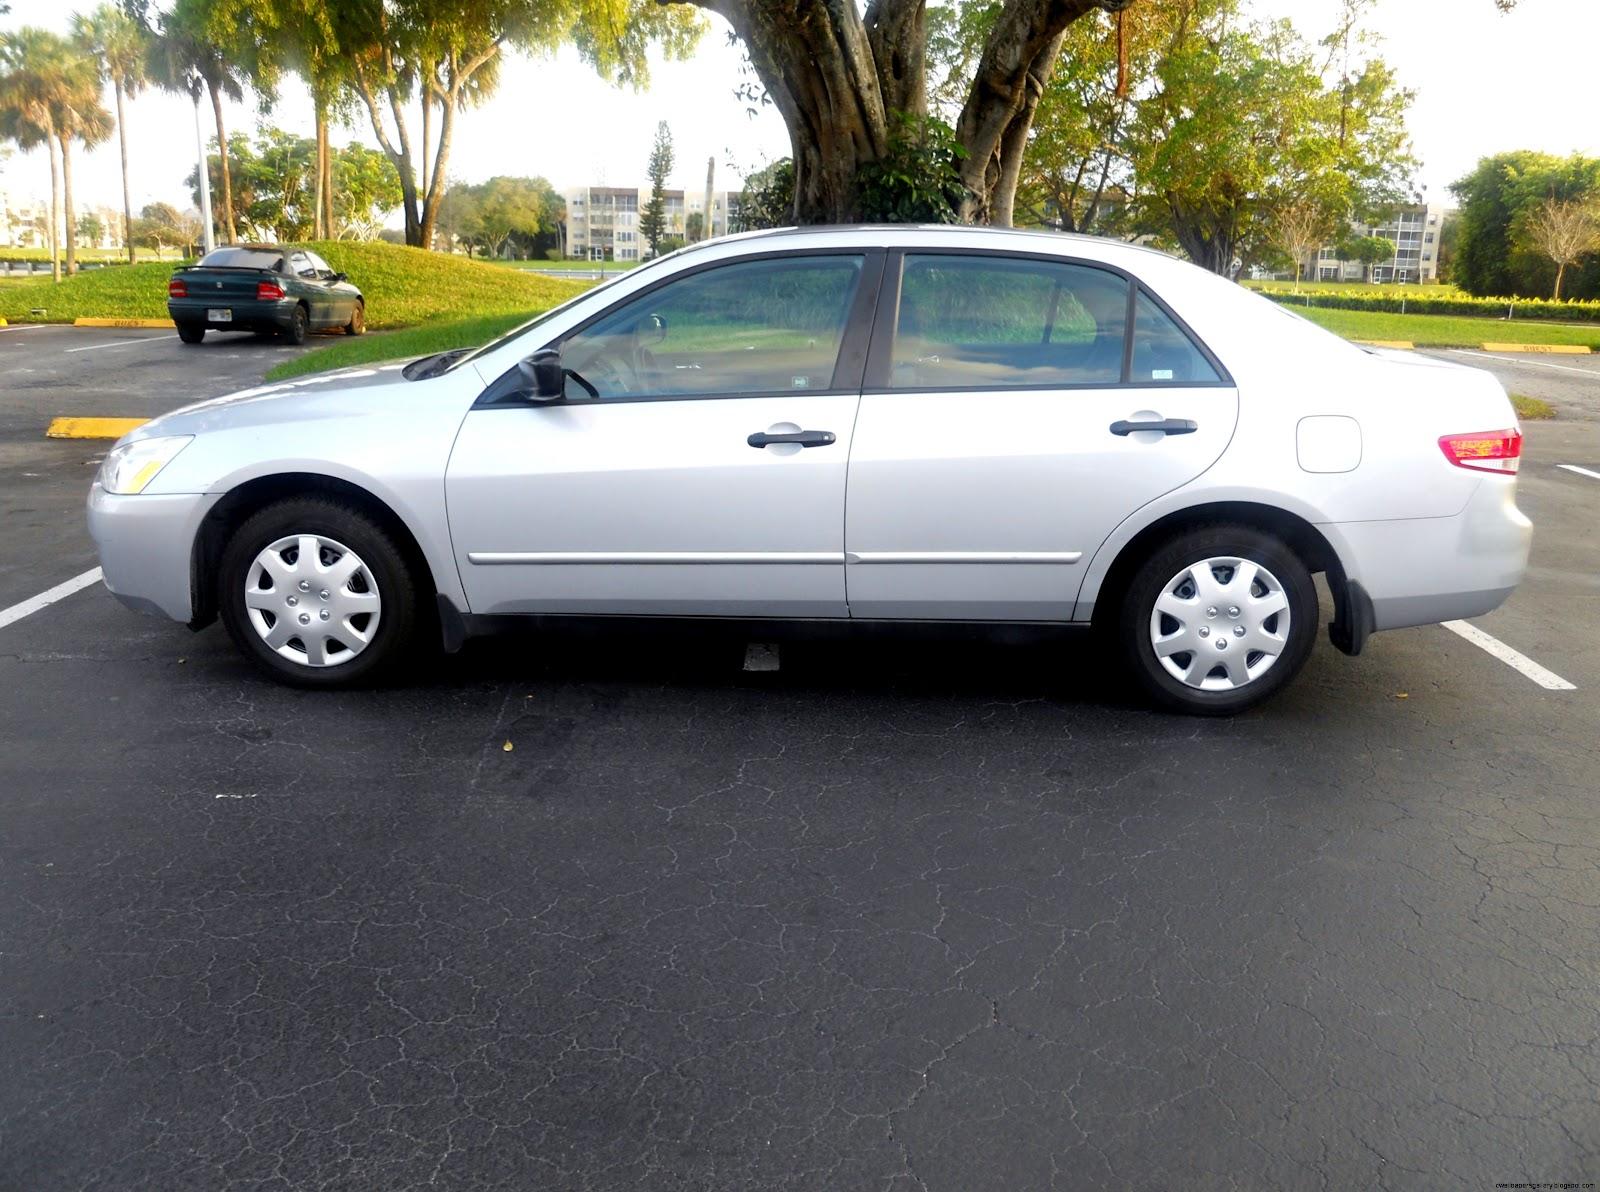 owner cars sale craigslist used delaware car near accord honda cheap